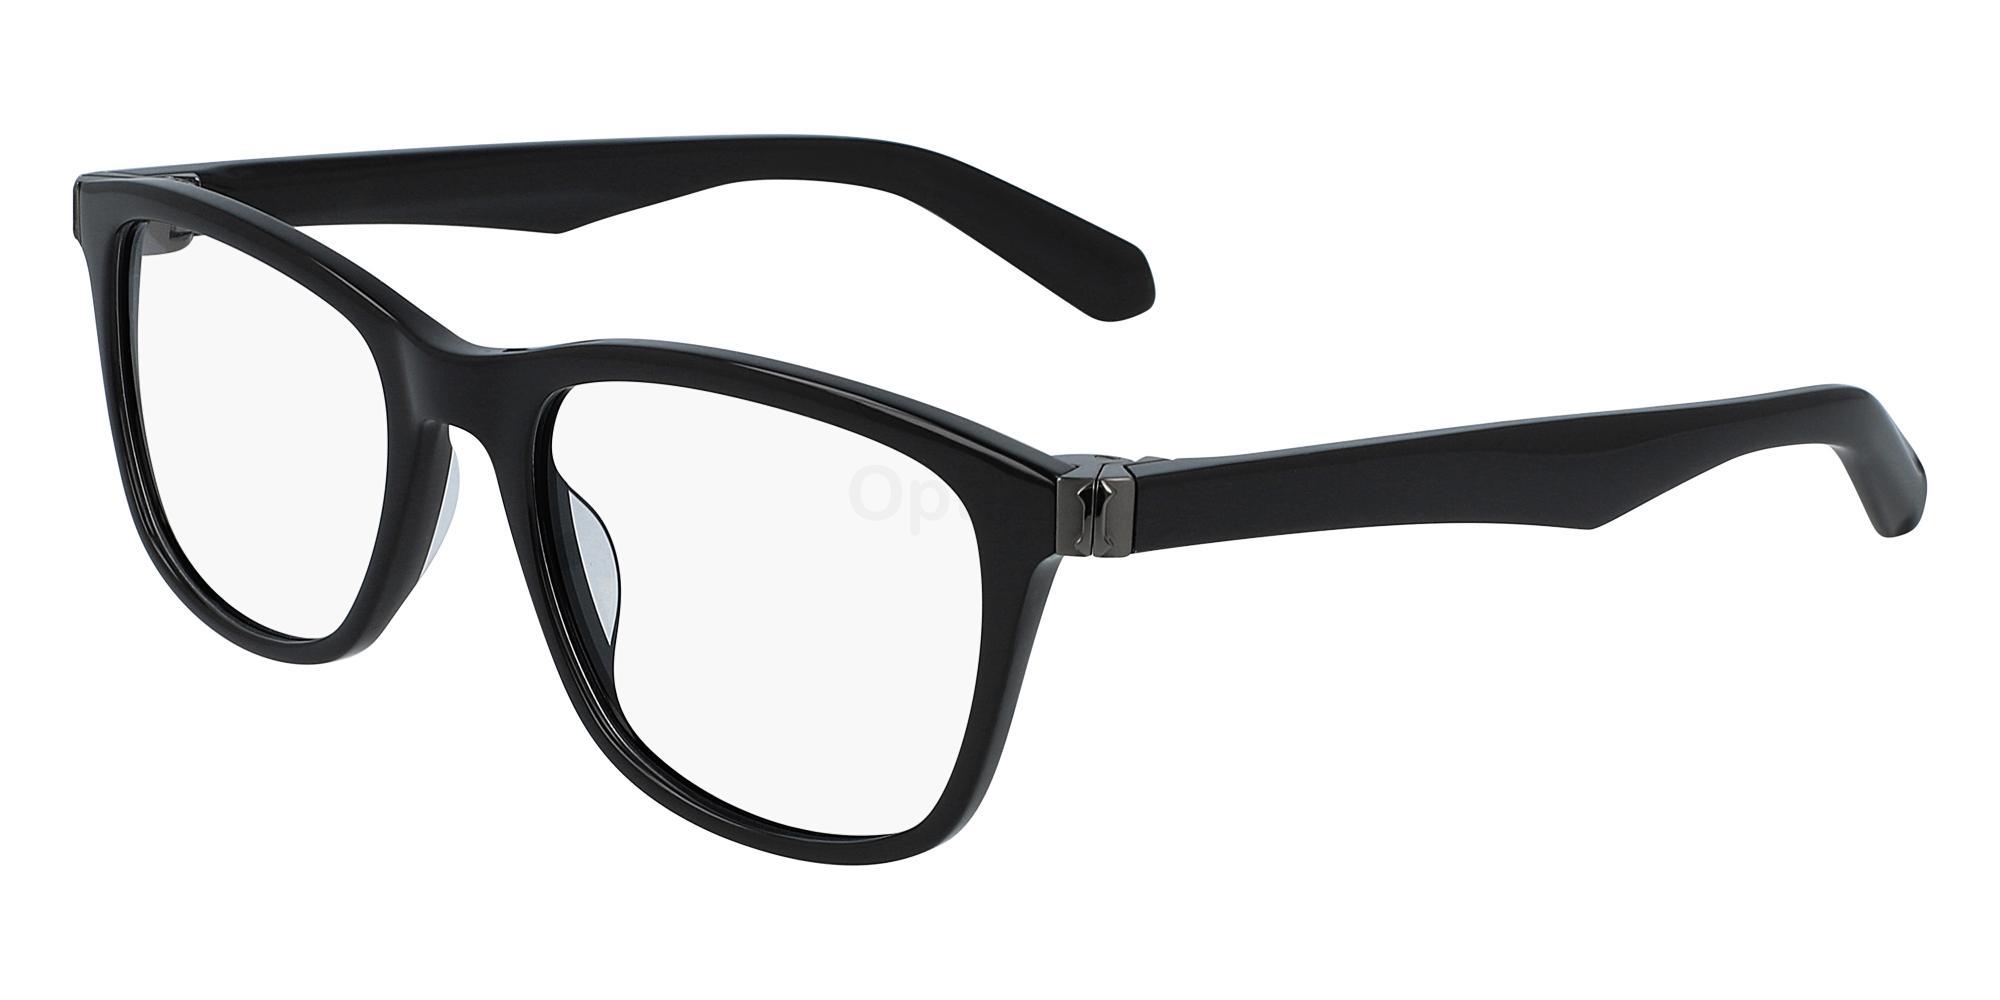 001 DR198 MANTHA Glasses, Dragon